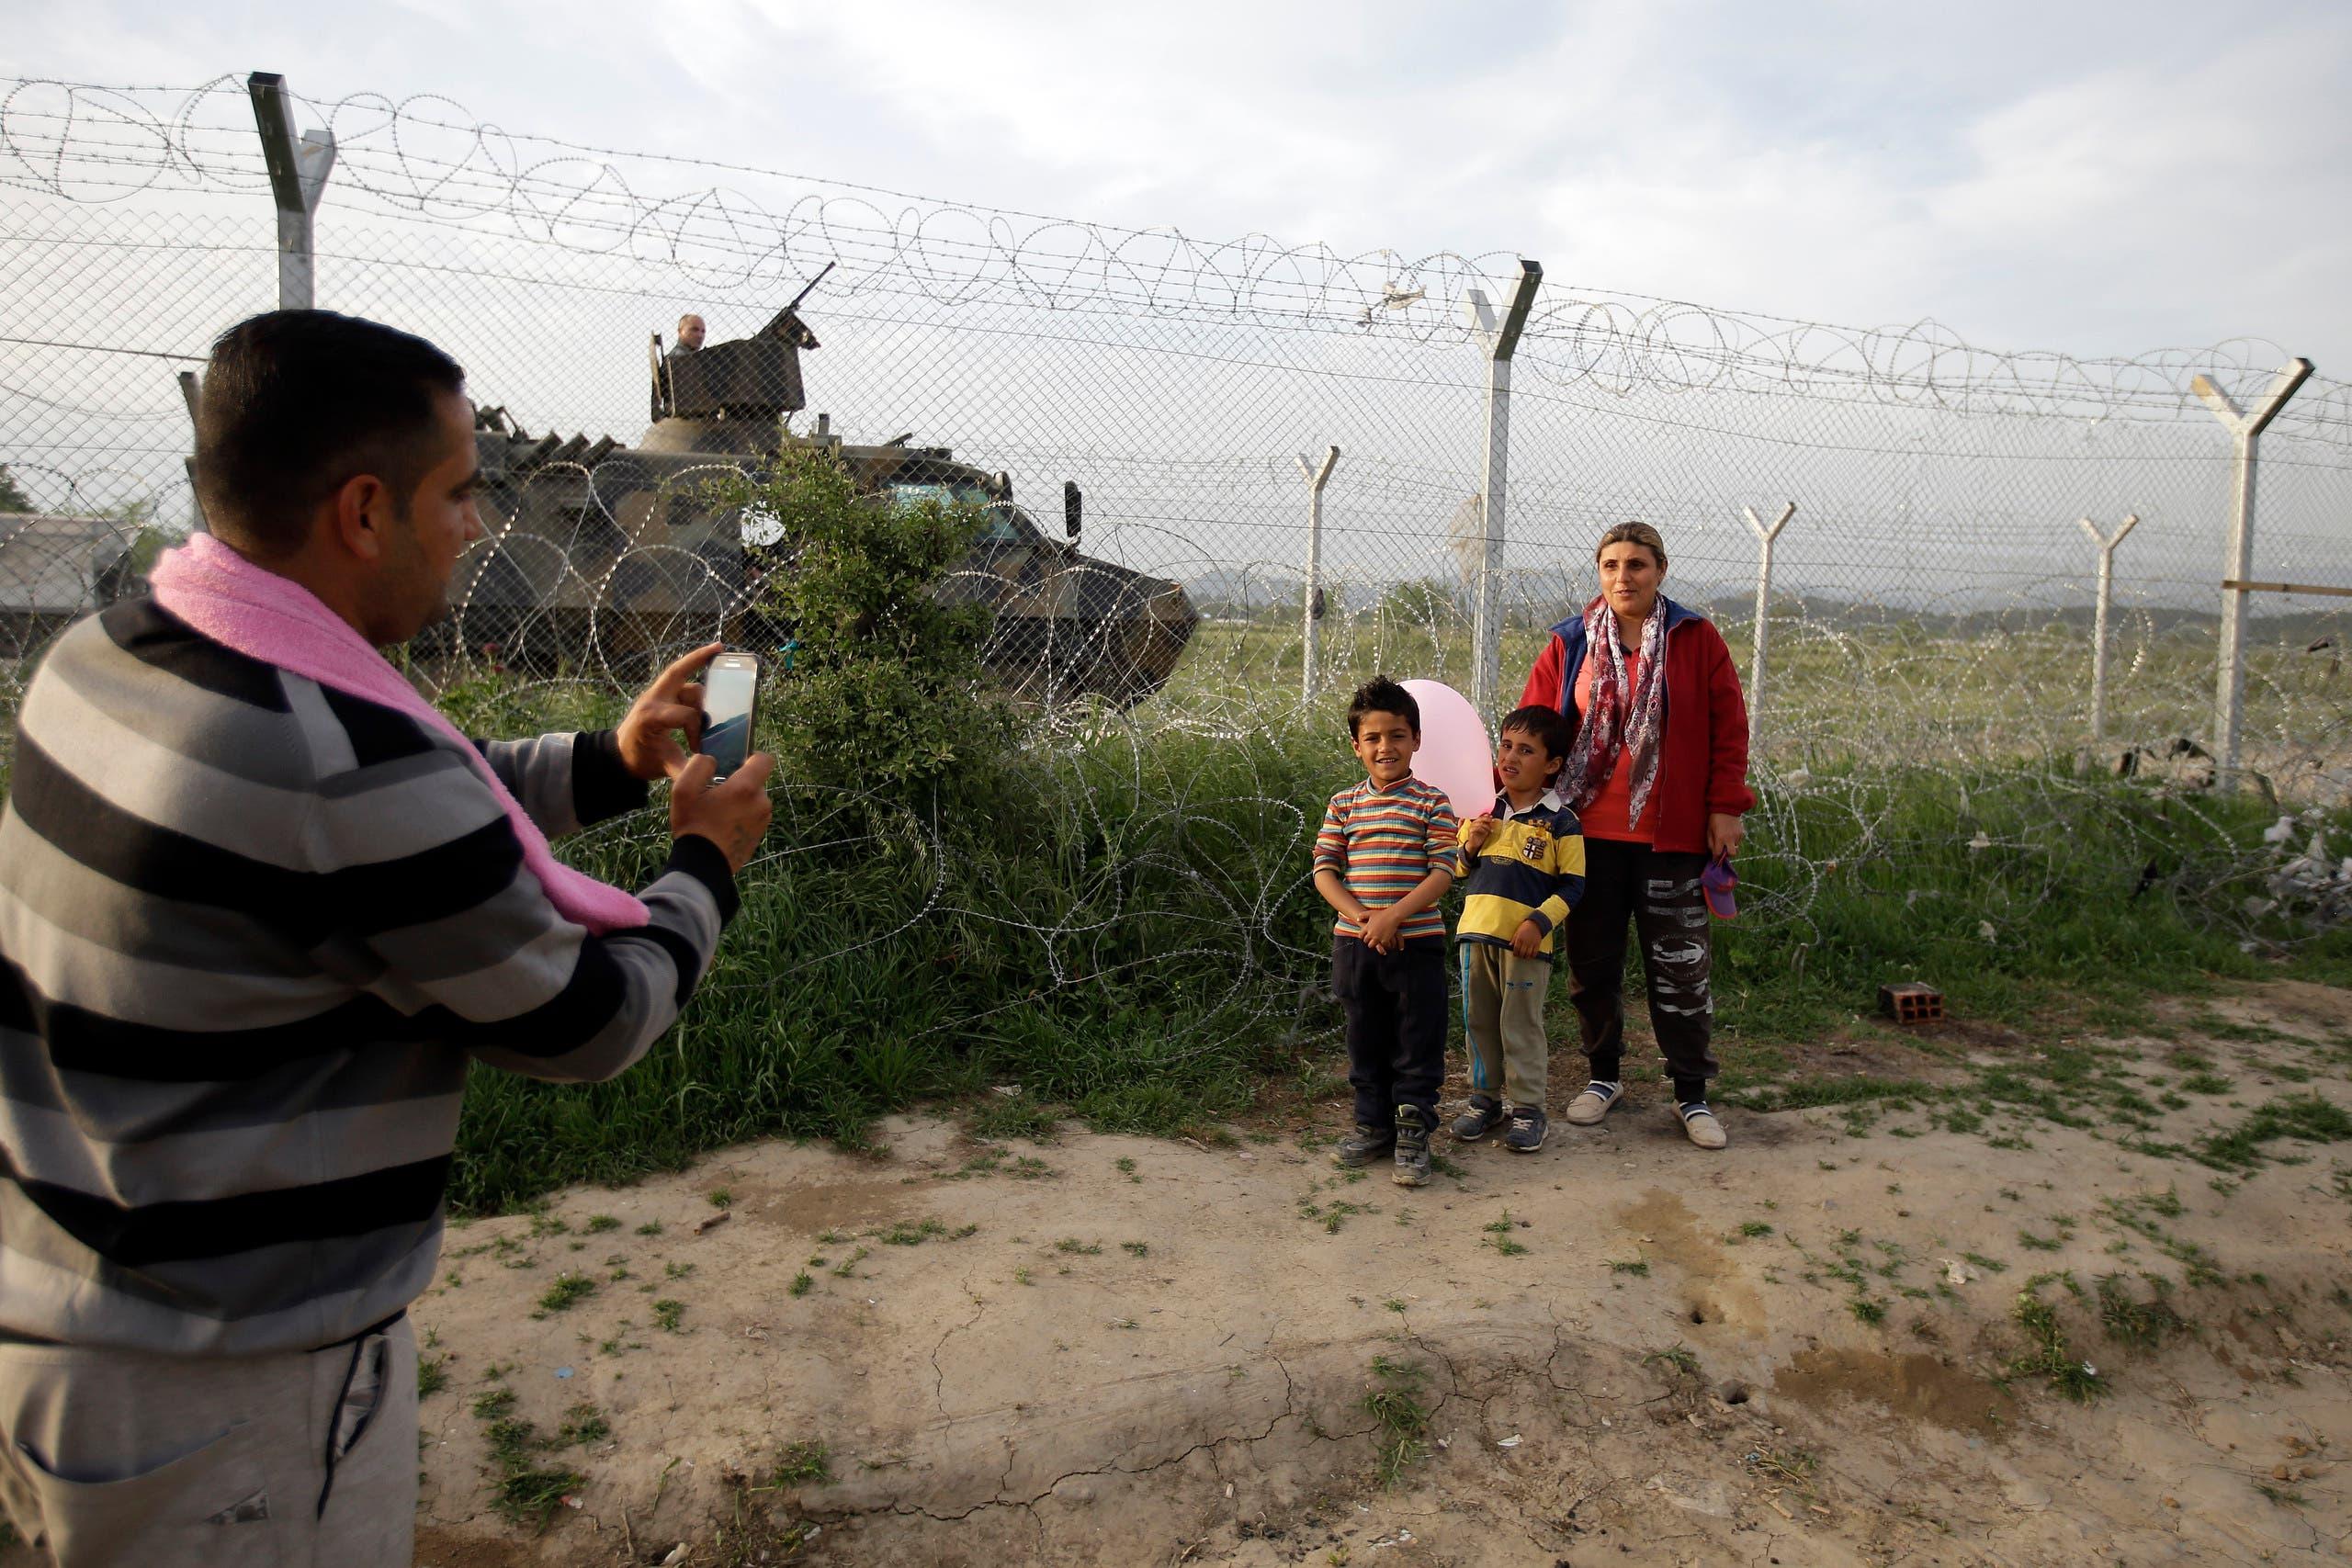 Migrants wait to cross into Macedonia